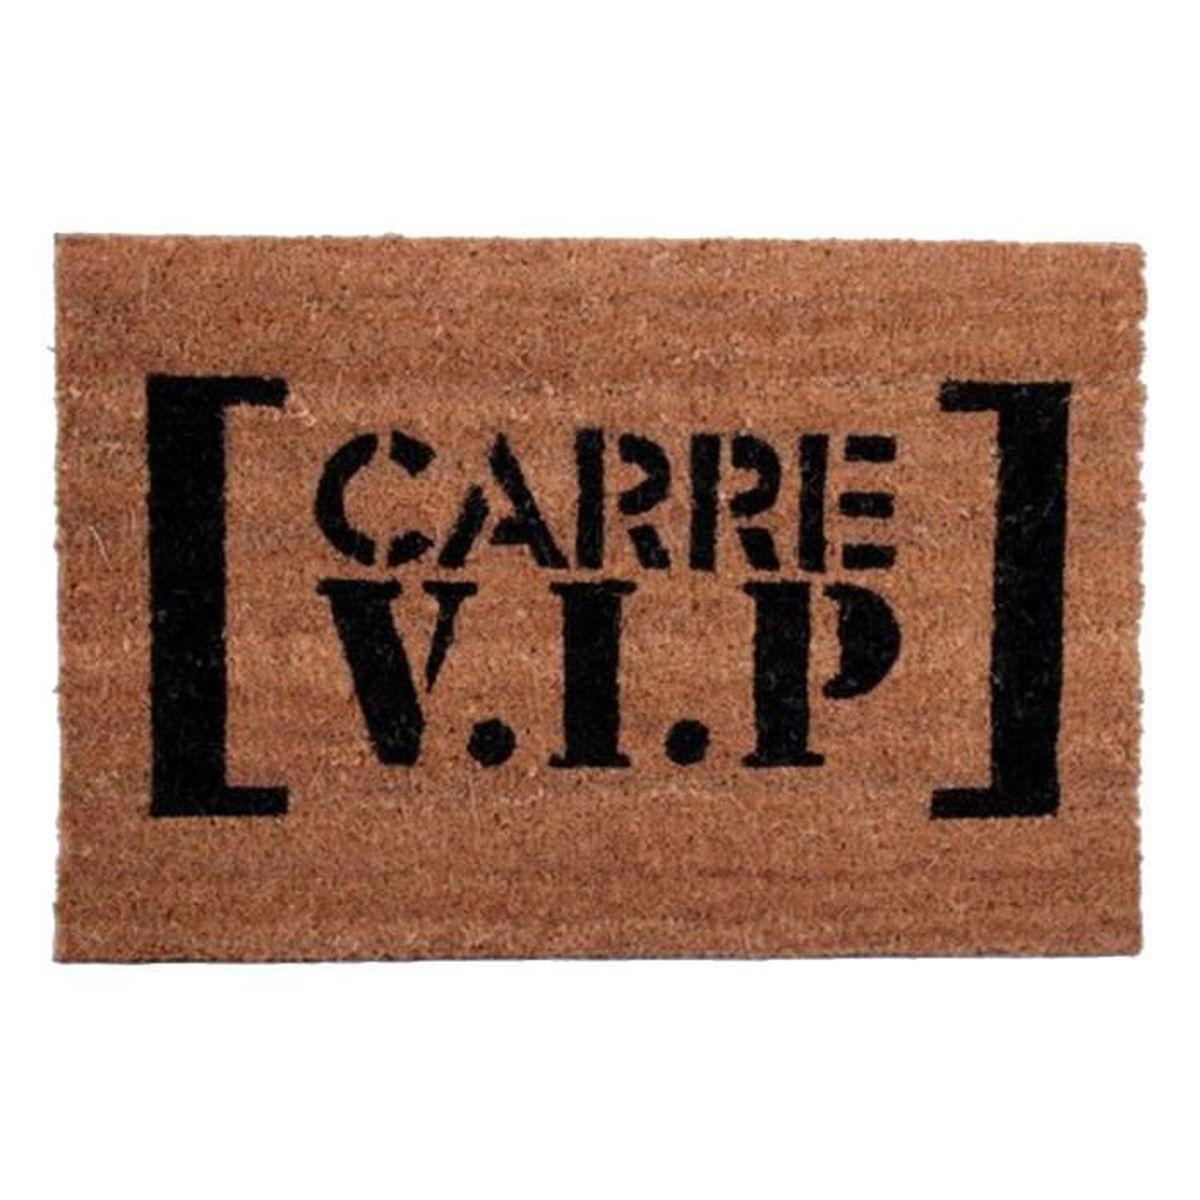 paillasson tapis brosse coco carre vip achat vente paillasson cdiscount. Black Bedroom Furniture Sets. Home Design Ideas